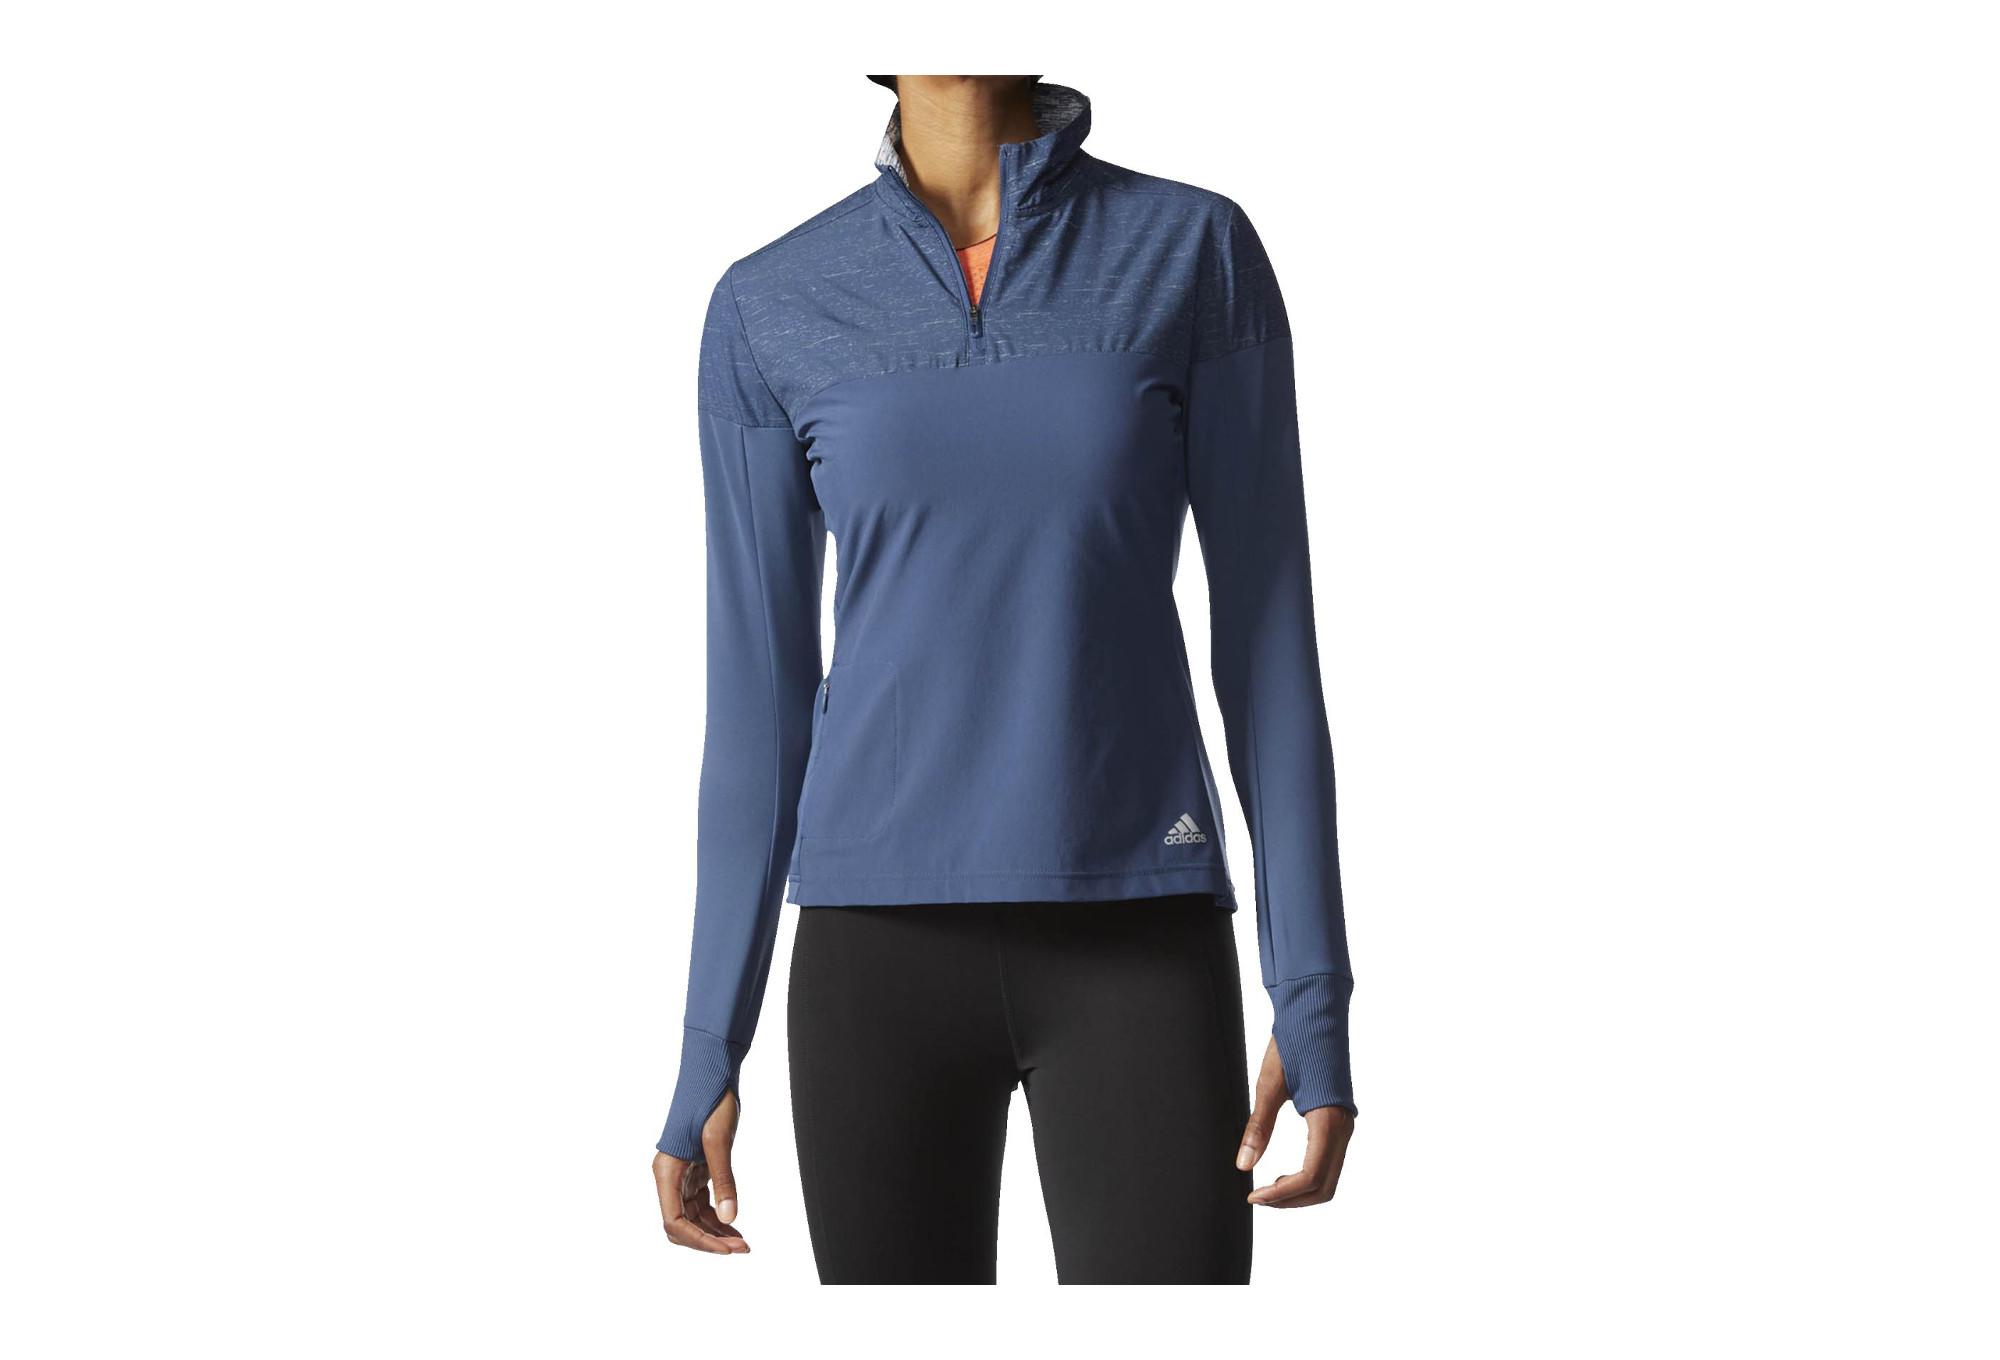 adidas SUPERNOVA STORM Jacket Half-Zip Blue Women